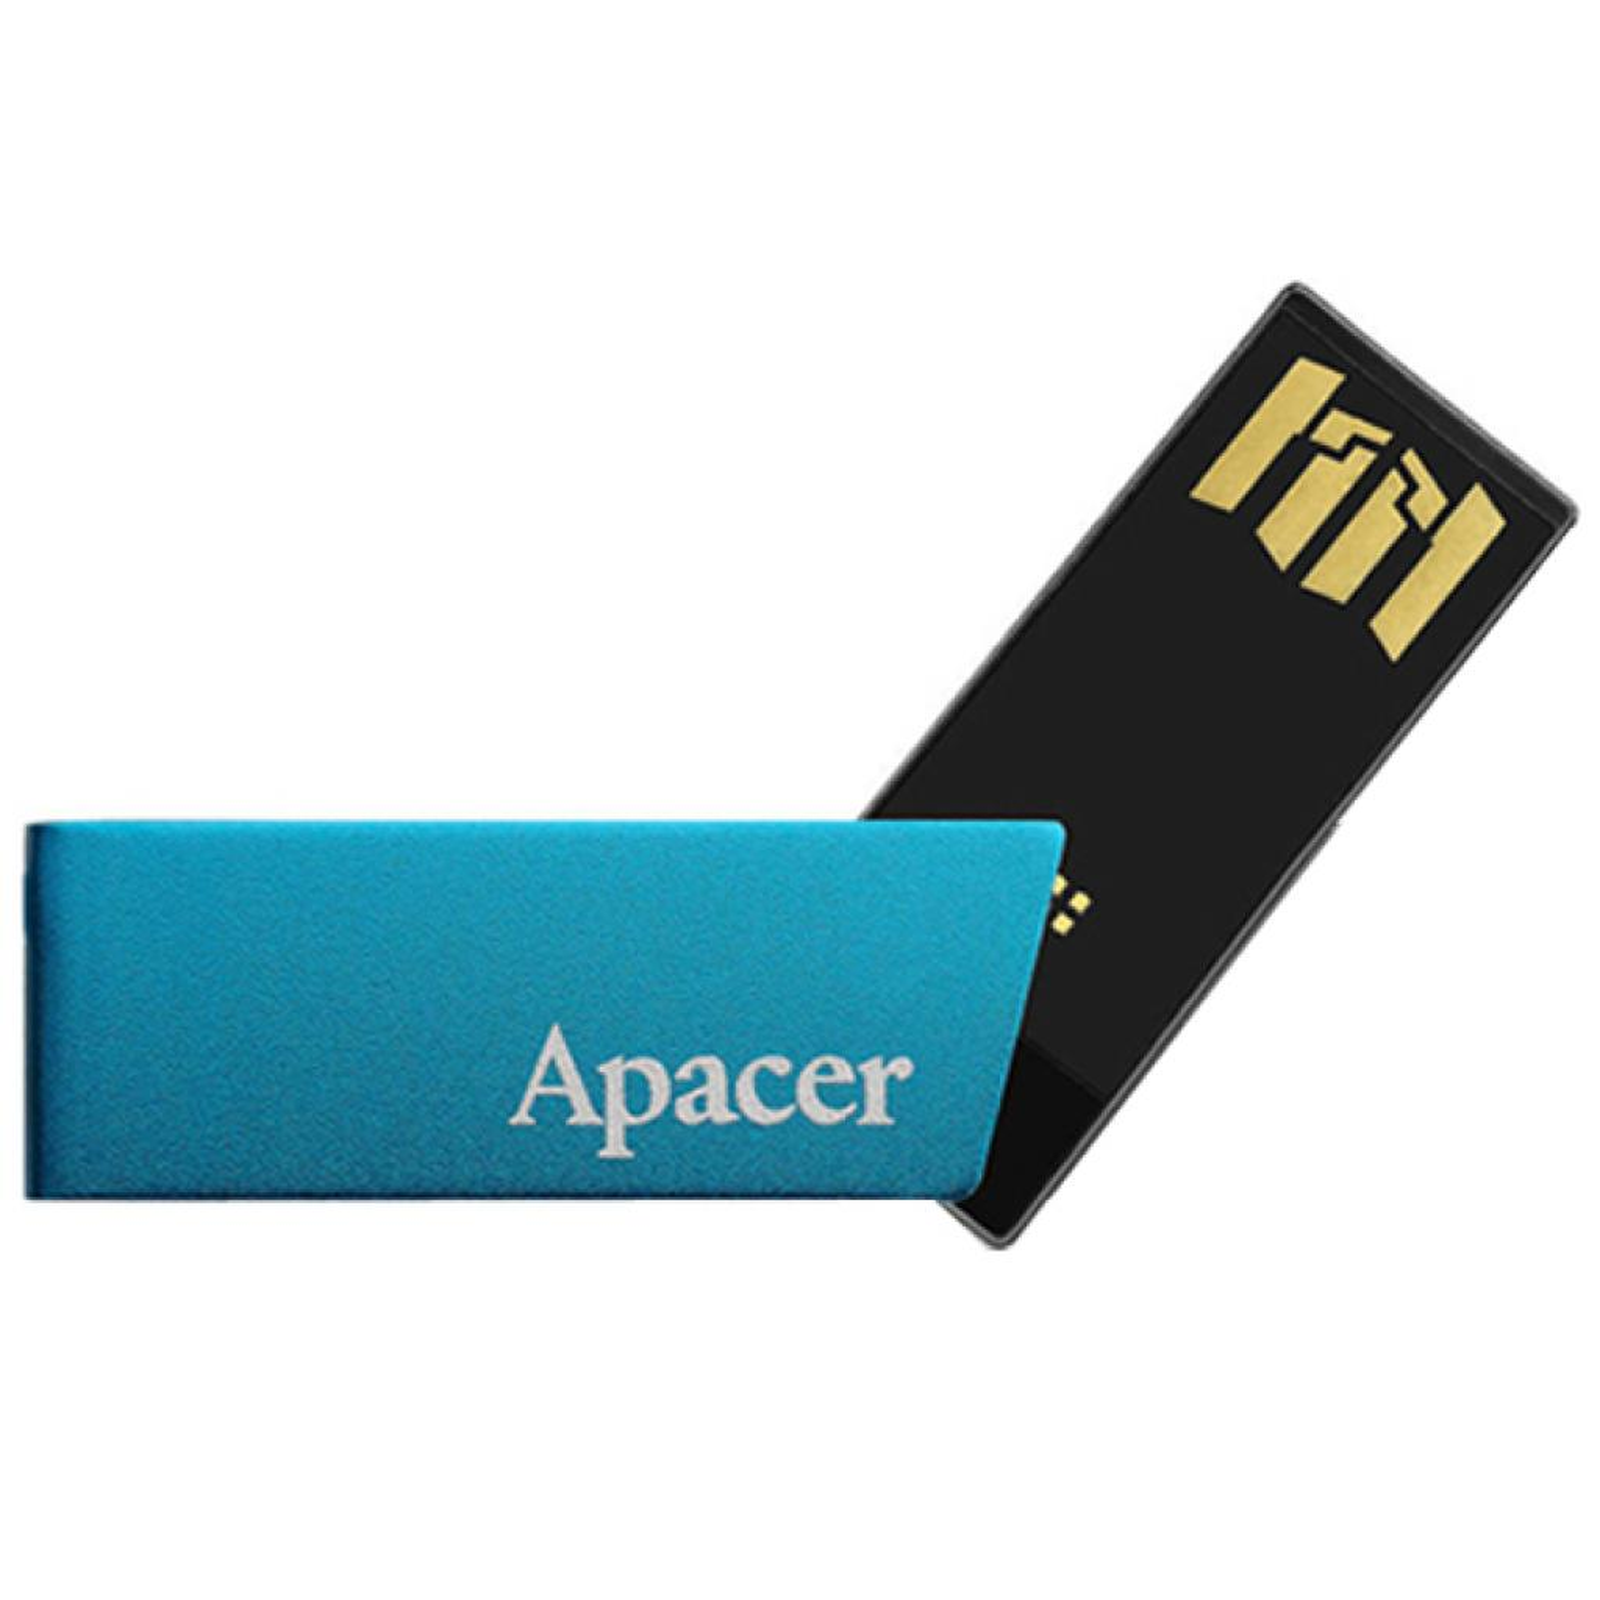 USB флеш накопитель 8GB AH130 Blue RP USB2.0 Apacer (AP8GAH130U-1) изображение 4